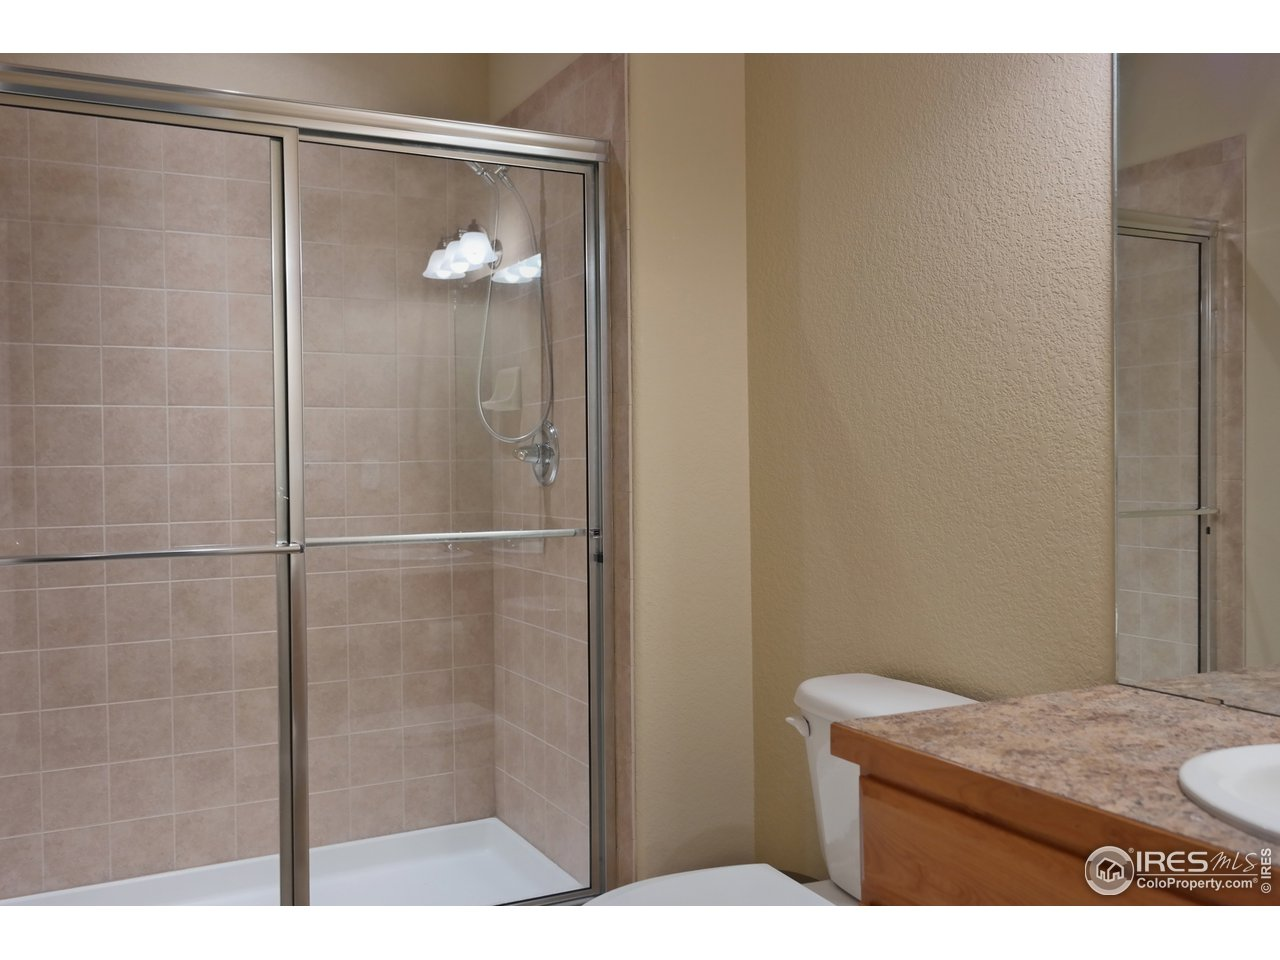 Attractive 3/4 Bath in Basement